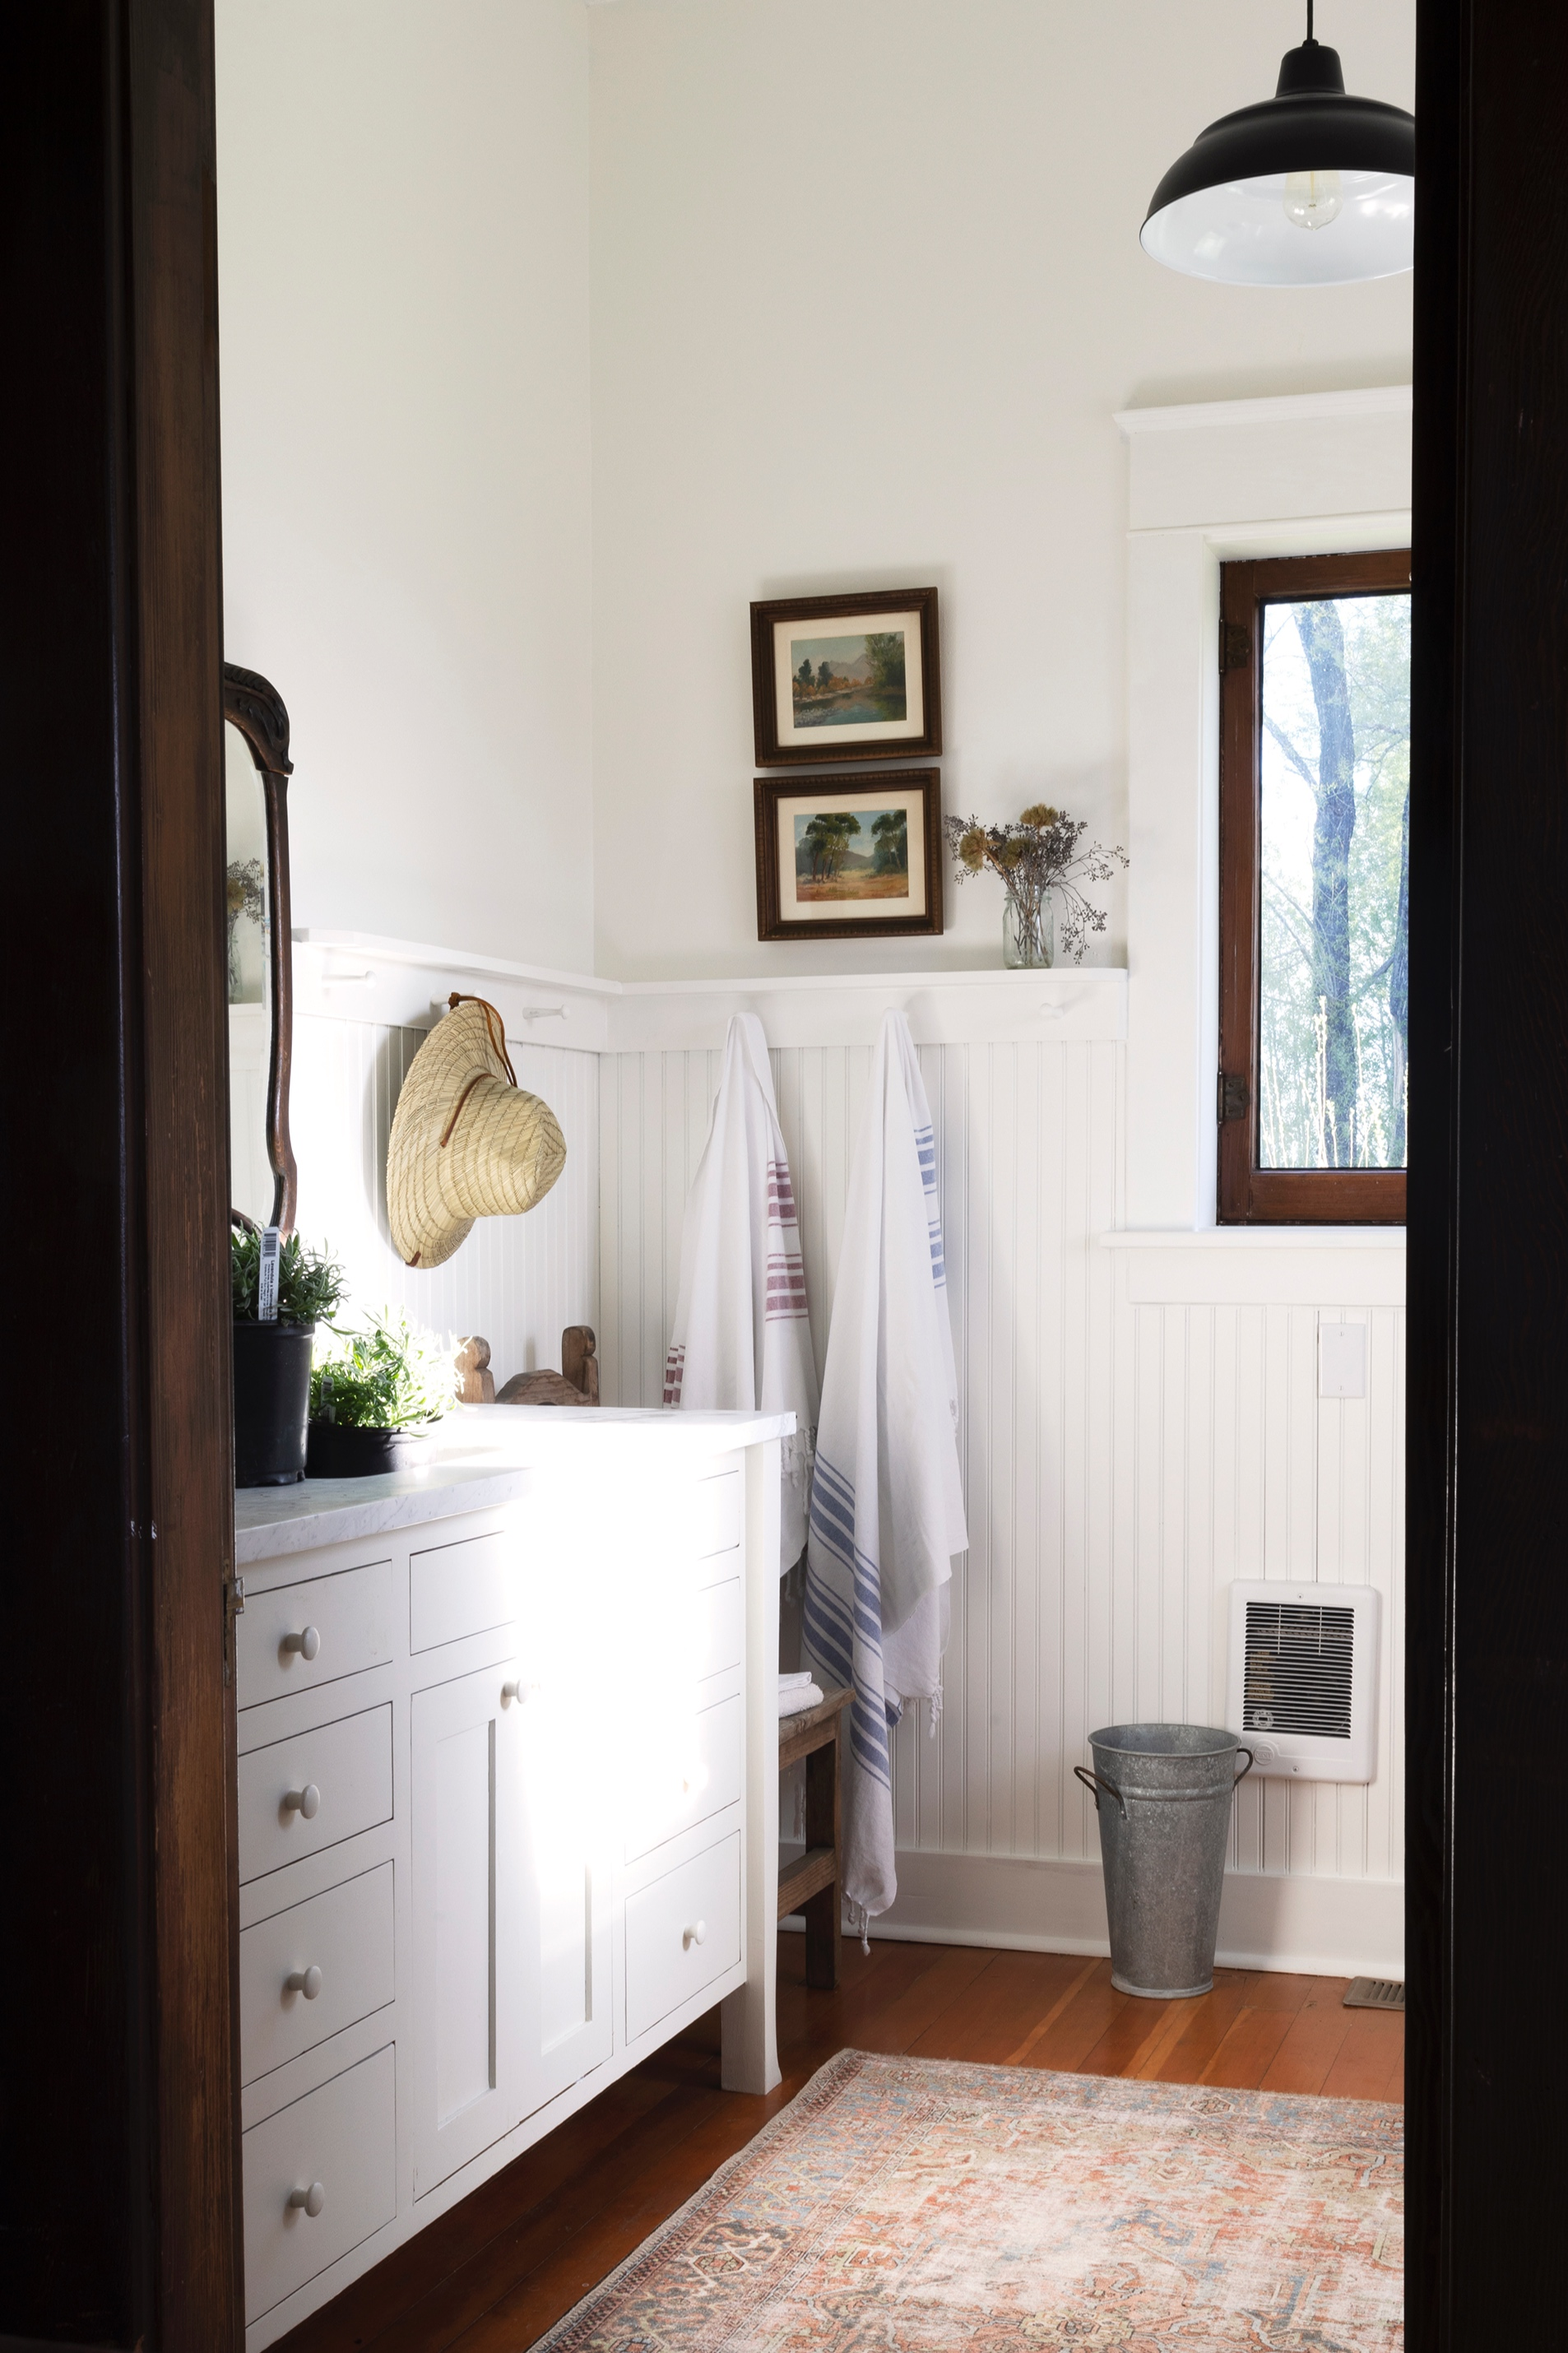 The+Grit+and+Polish+-+Farmhouse+Bathroom+Big+Lavendar+in+Sink+SUN+3.3.jpg